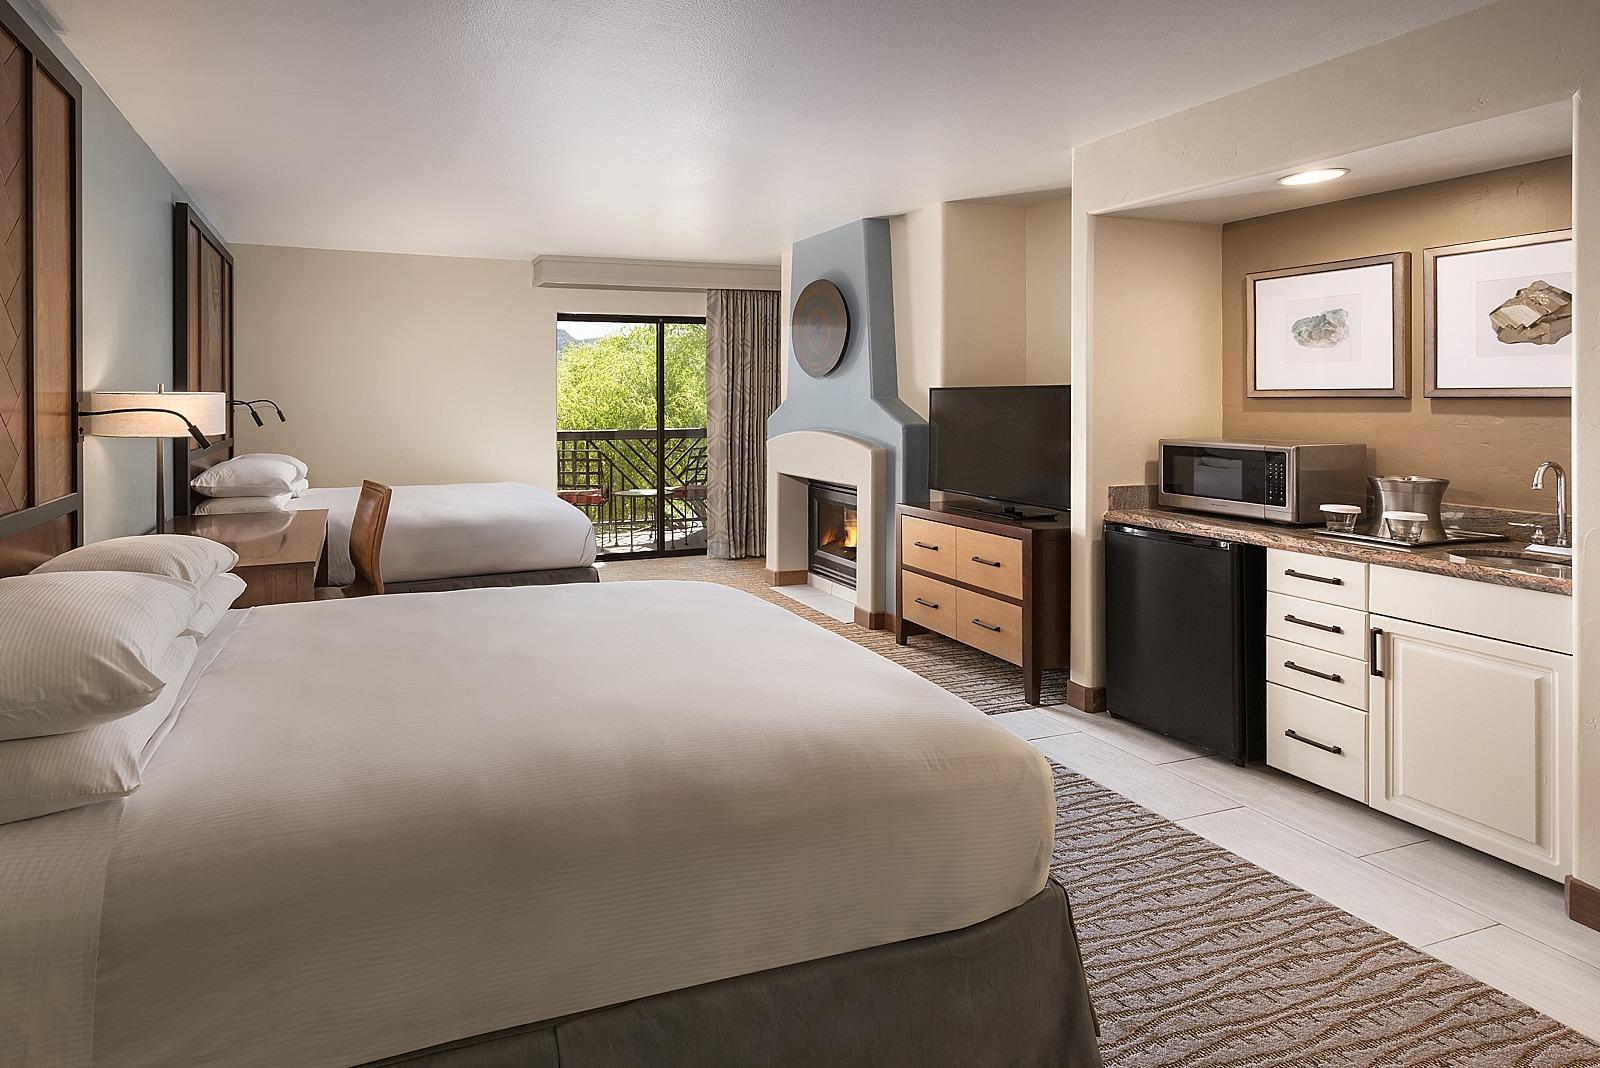 sedona getaway hilton sedona resort diana elizabeth. Black Bedroom Furniture Sets. Home Design Ideas